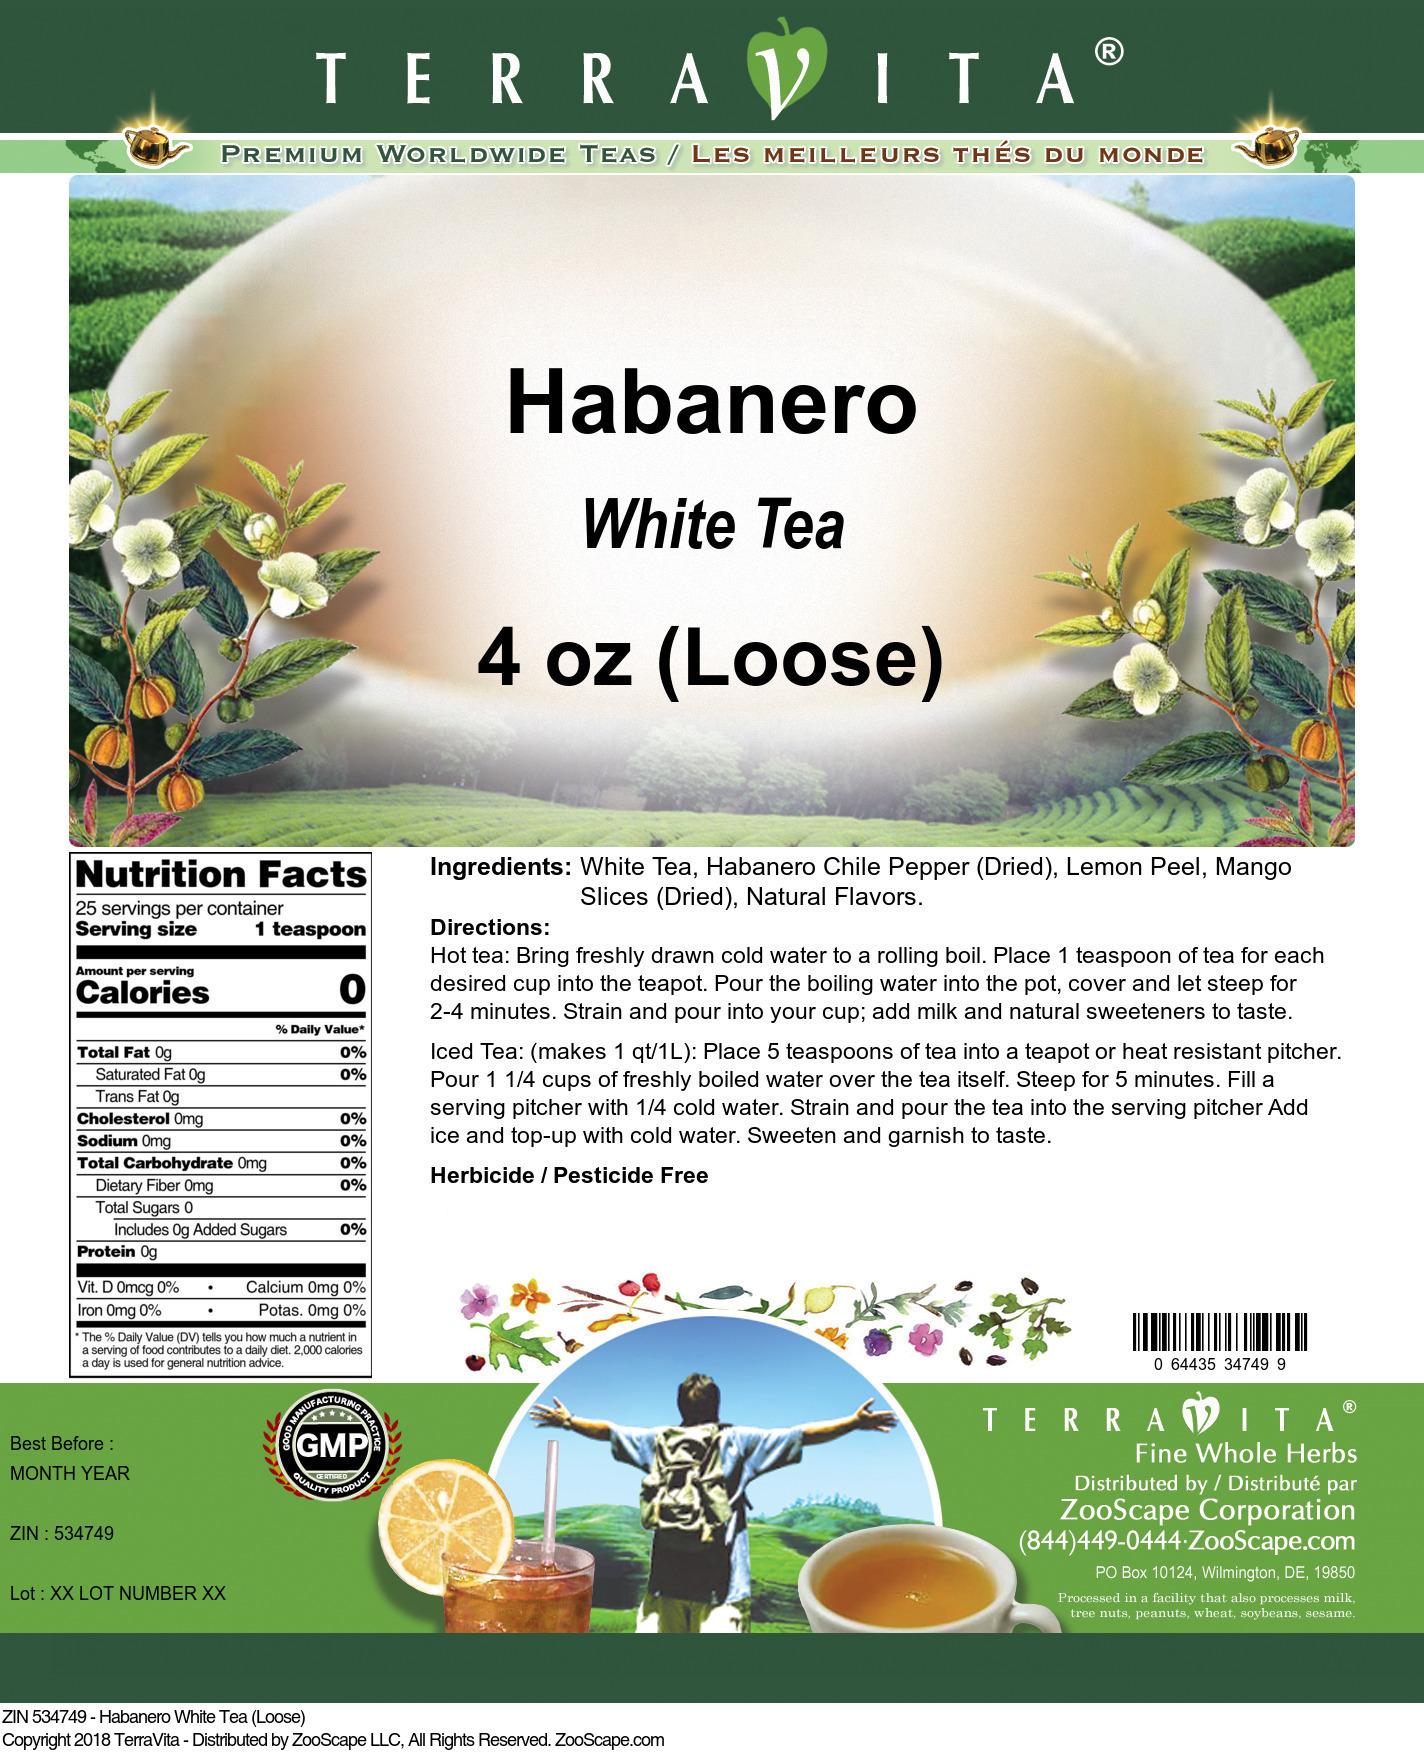 Habanero White Tea